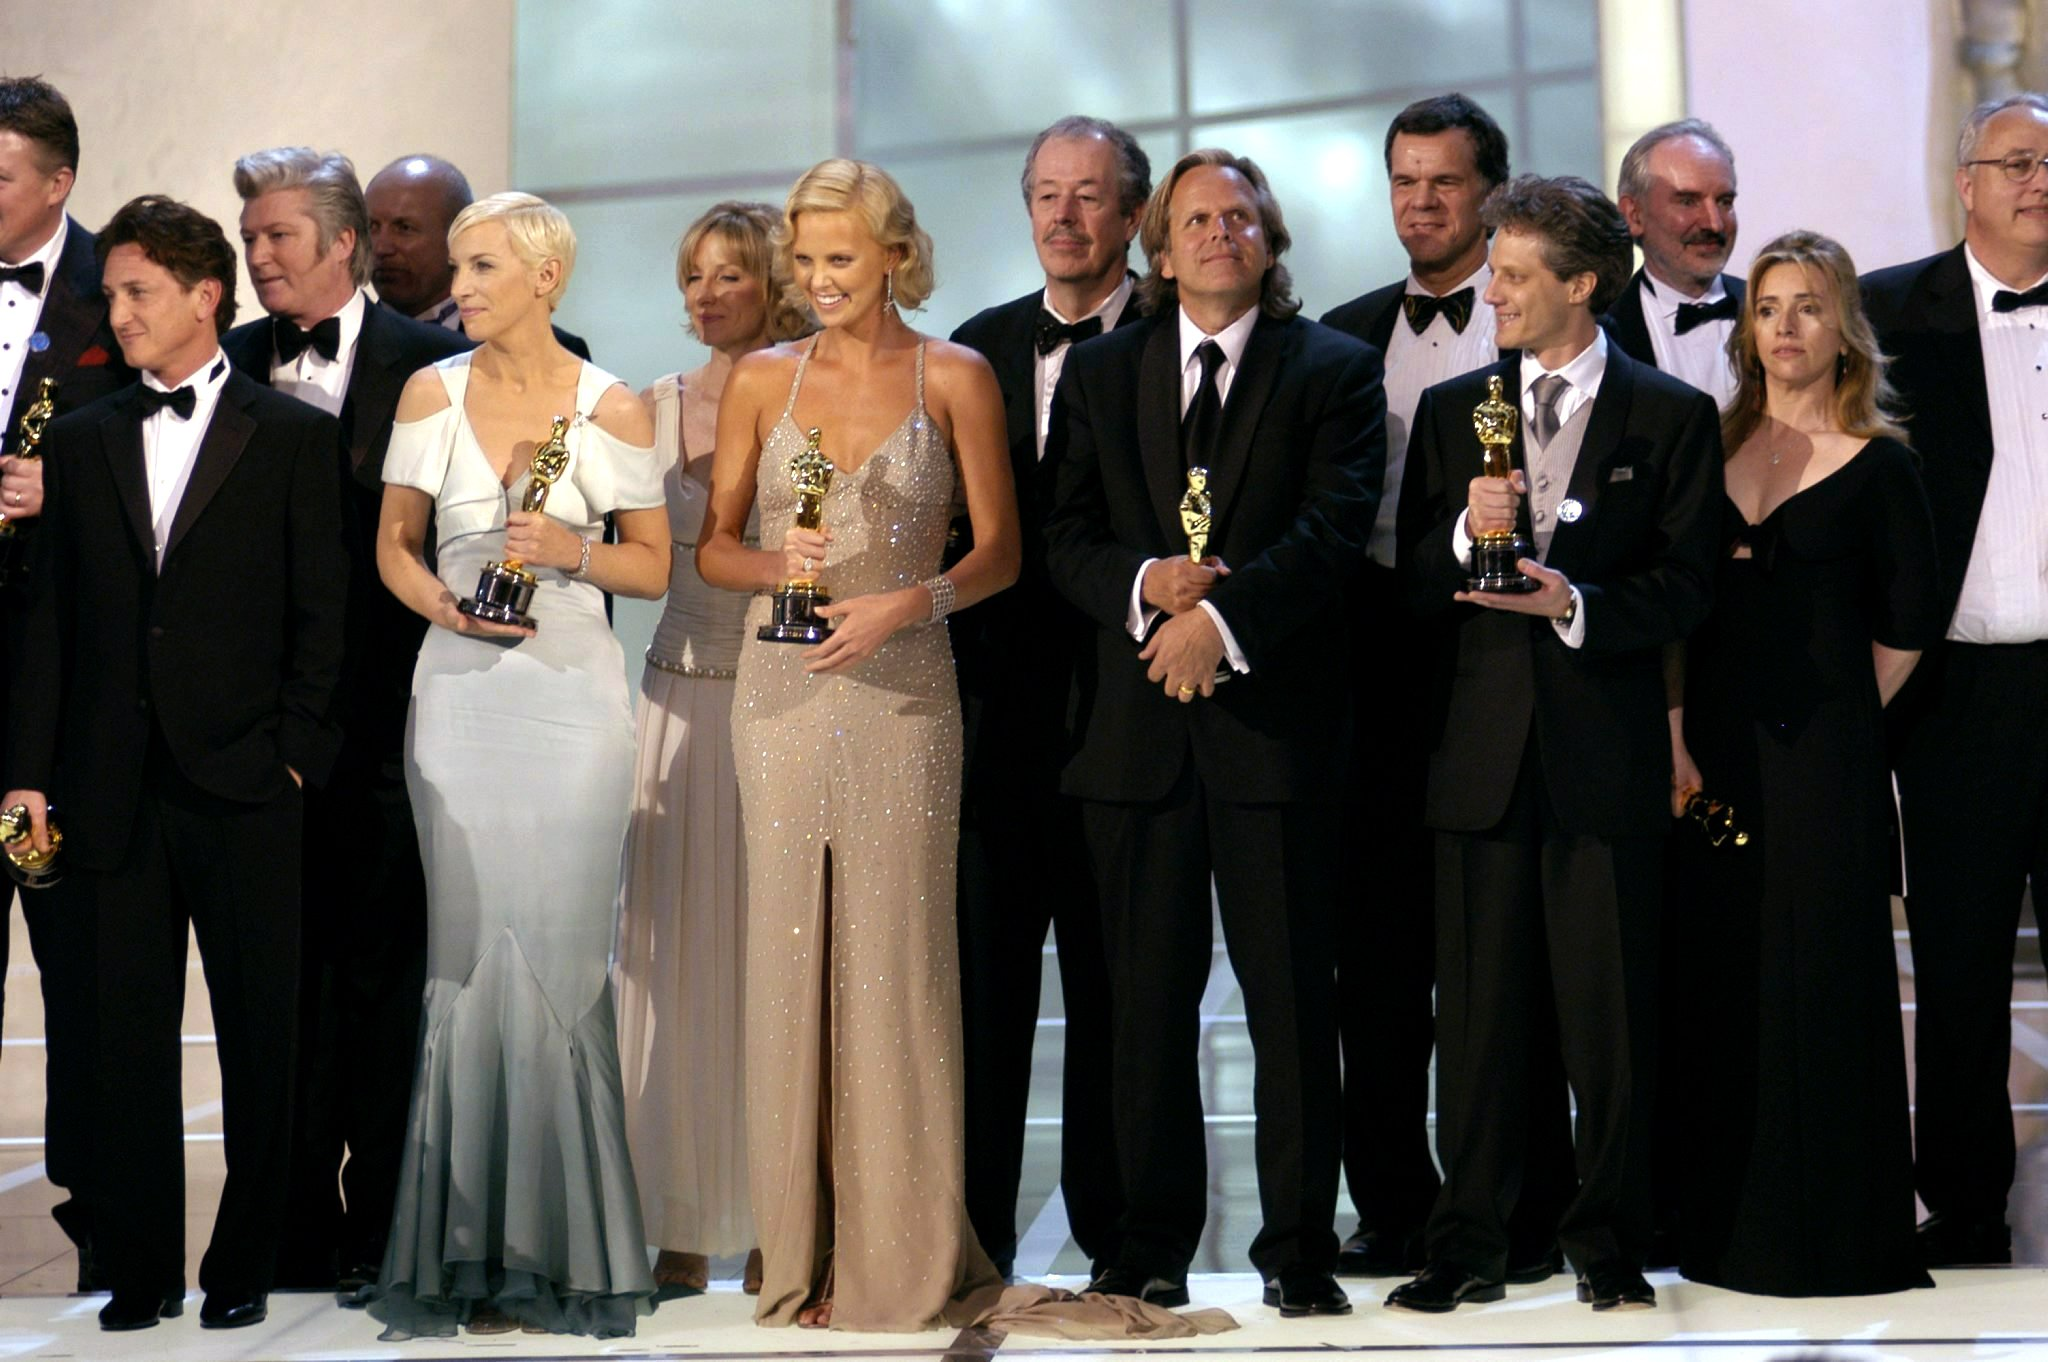 From left, Best Actor Academy Award winner Sean Penn, Best Original Song Academy Award winner Annie Lennox and Best Actress A